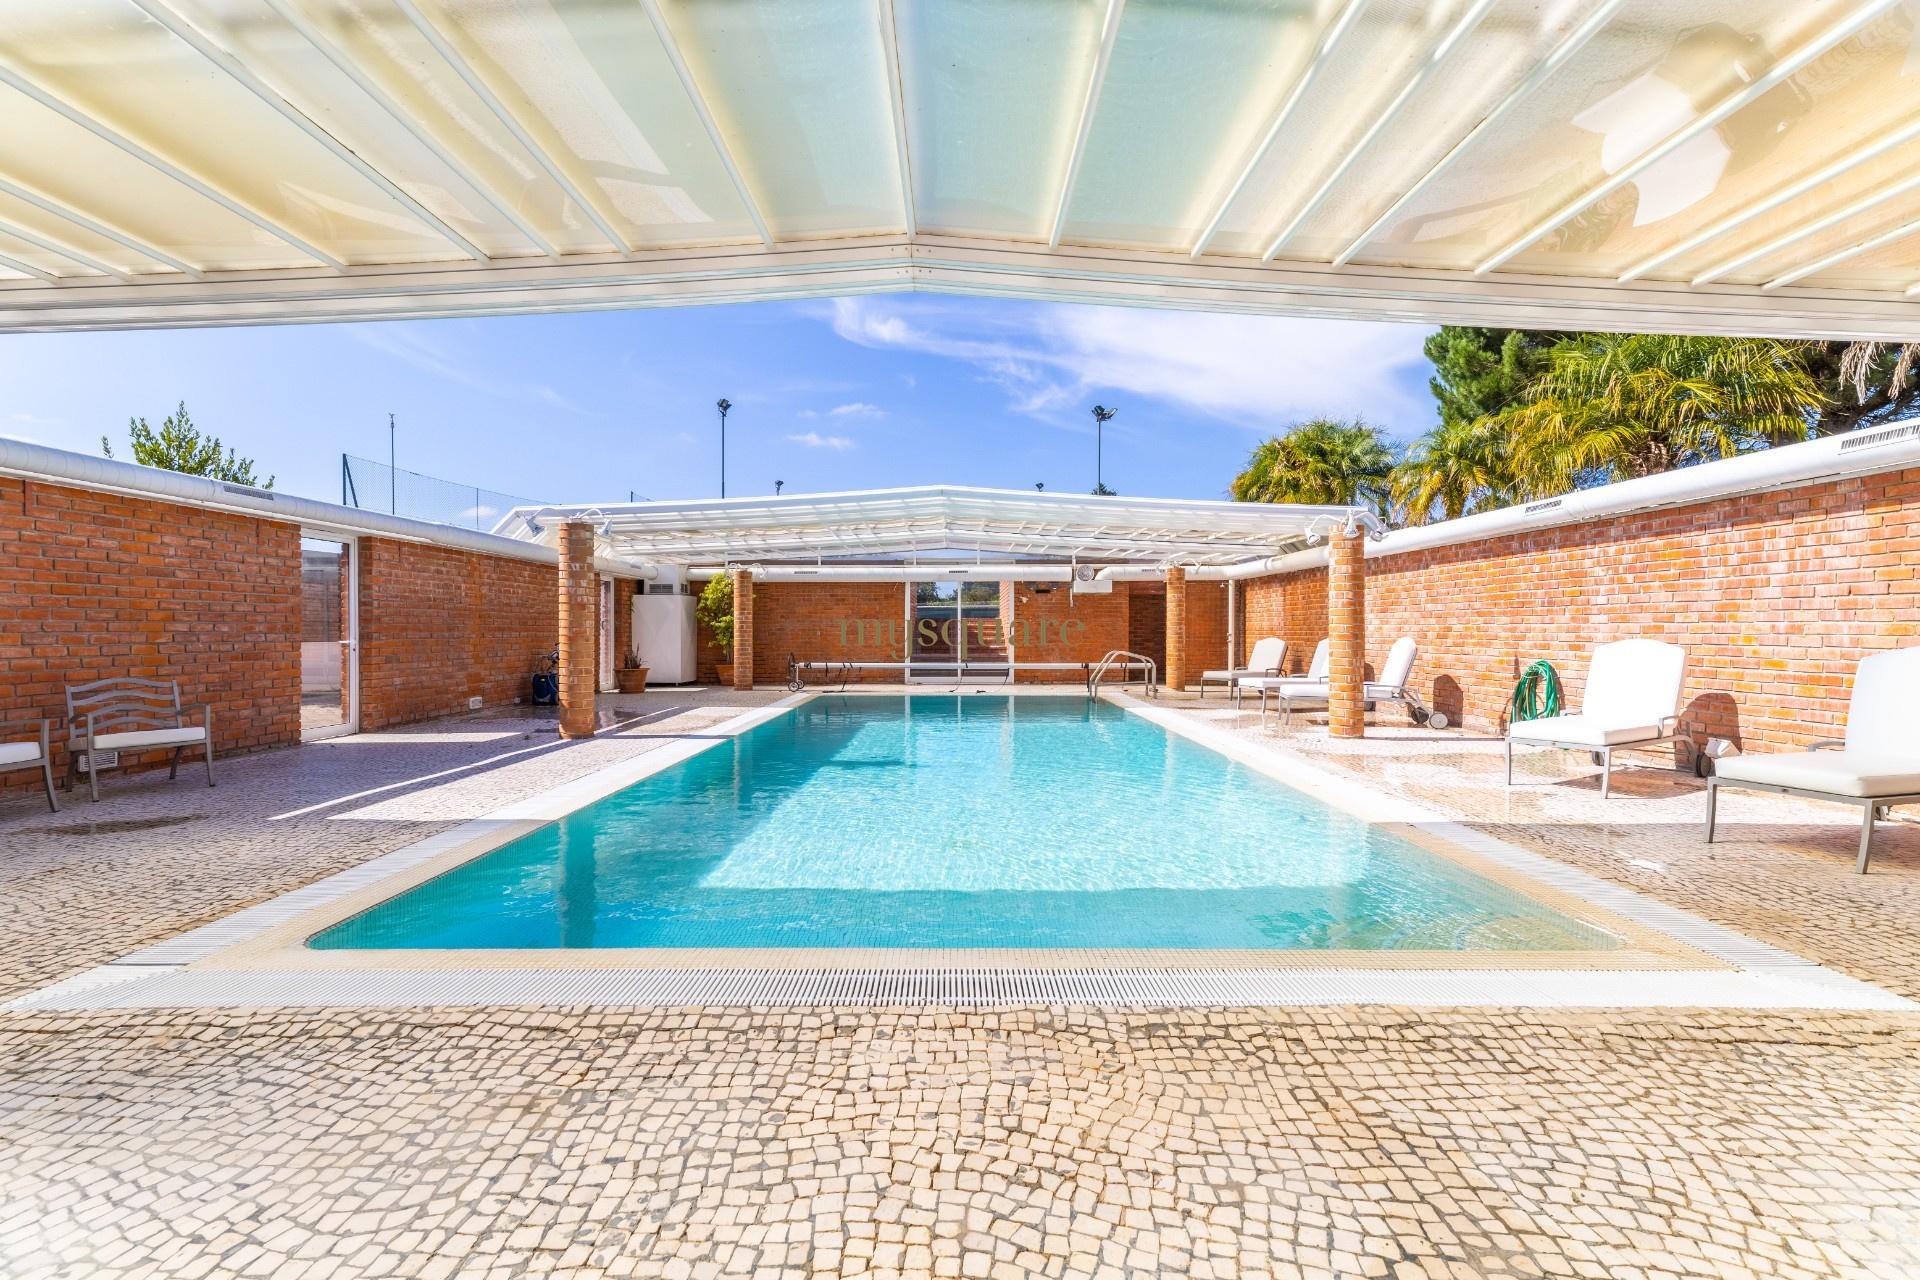 Moradia independente T5 com piscina, court ténis, sala de cinema, jacuzzi, sauna